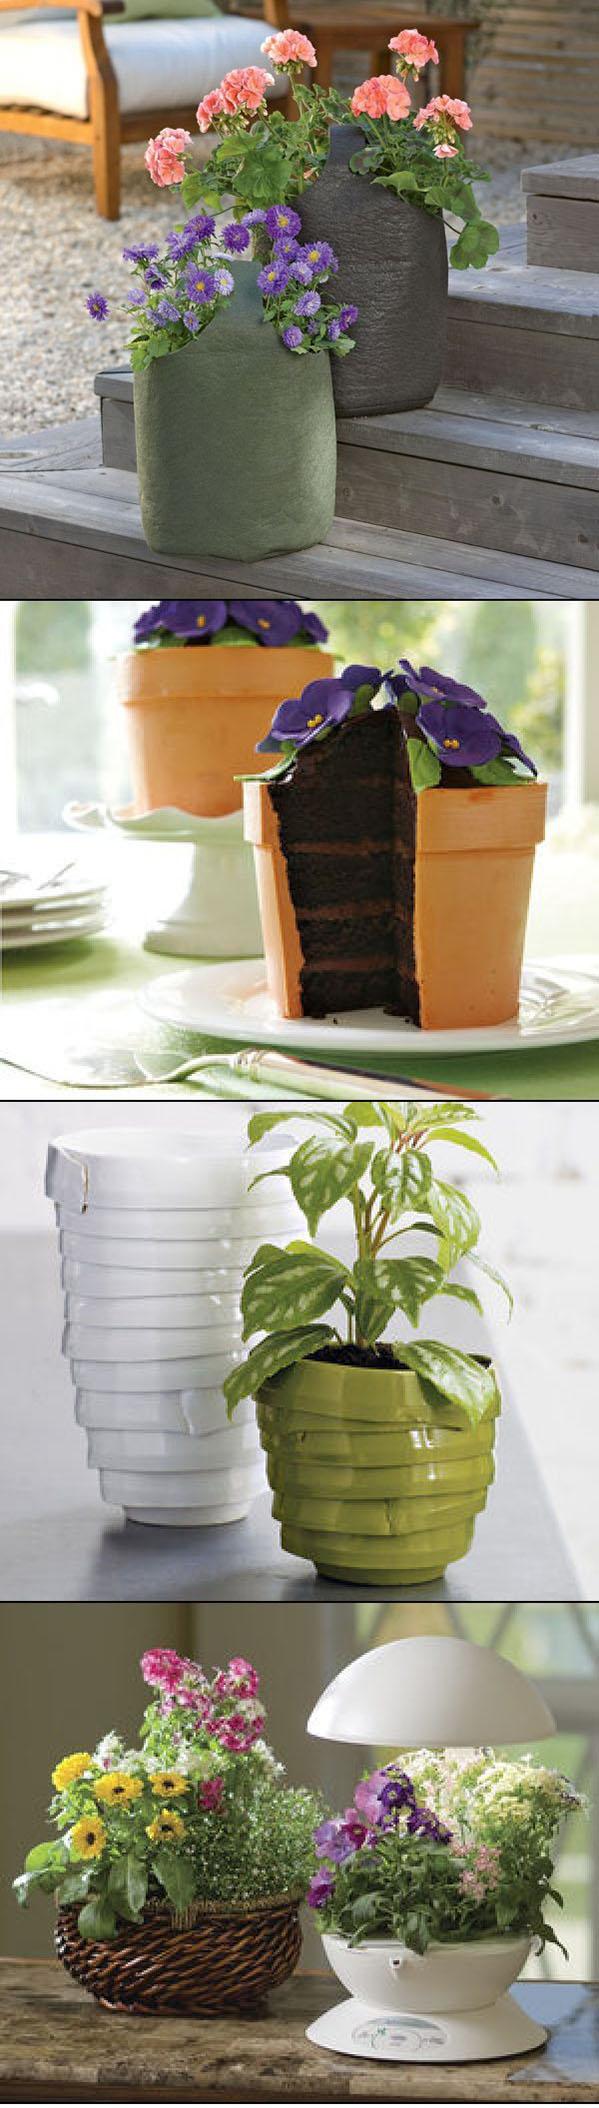 Easy And Beautiful Bonsai Ideas DIY & Crafts Tutorials